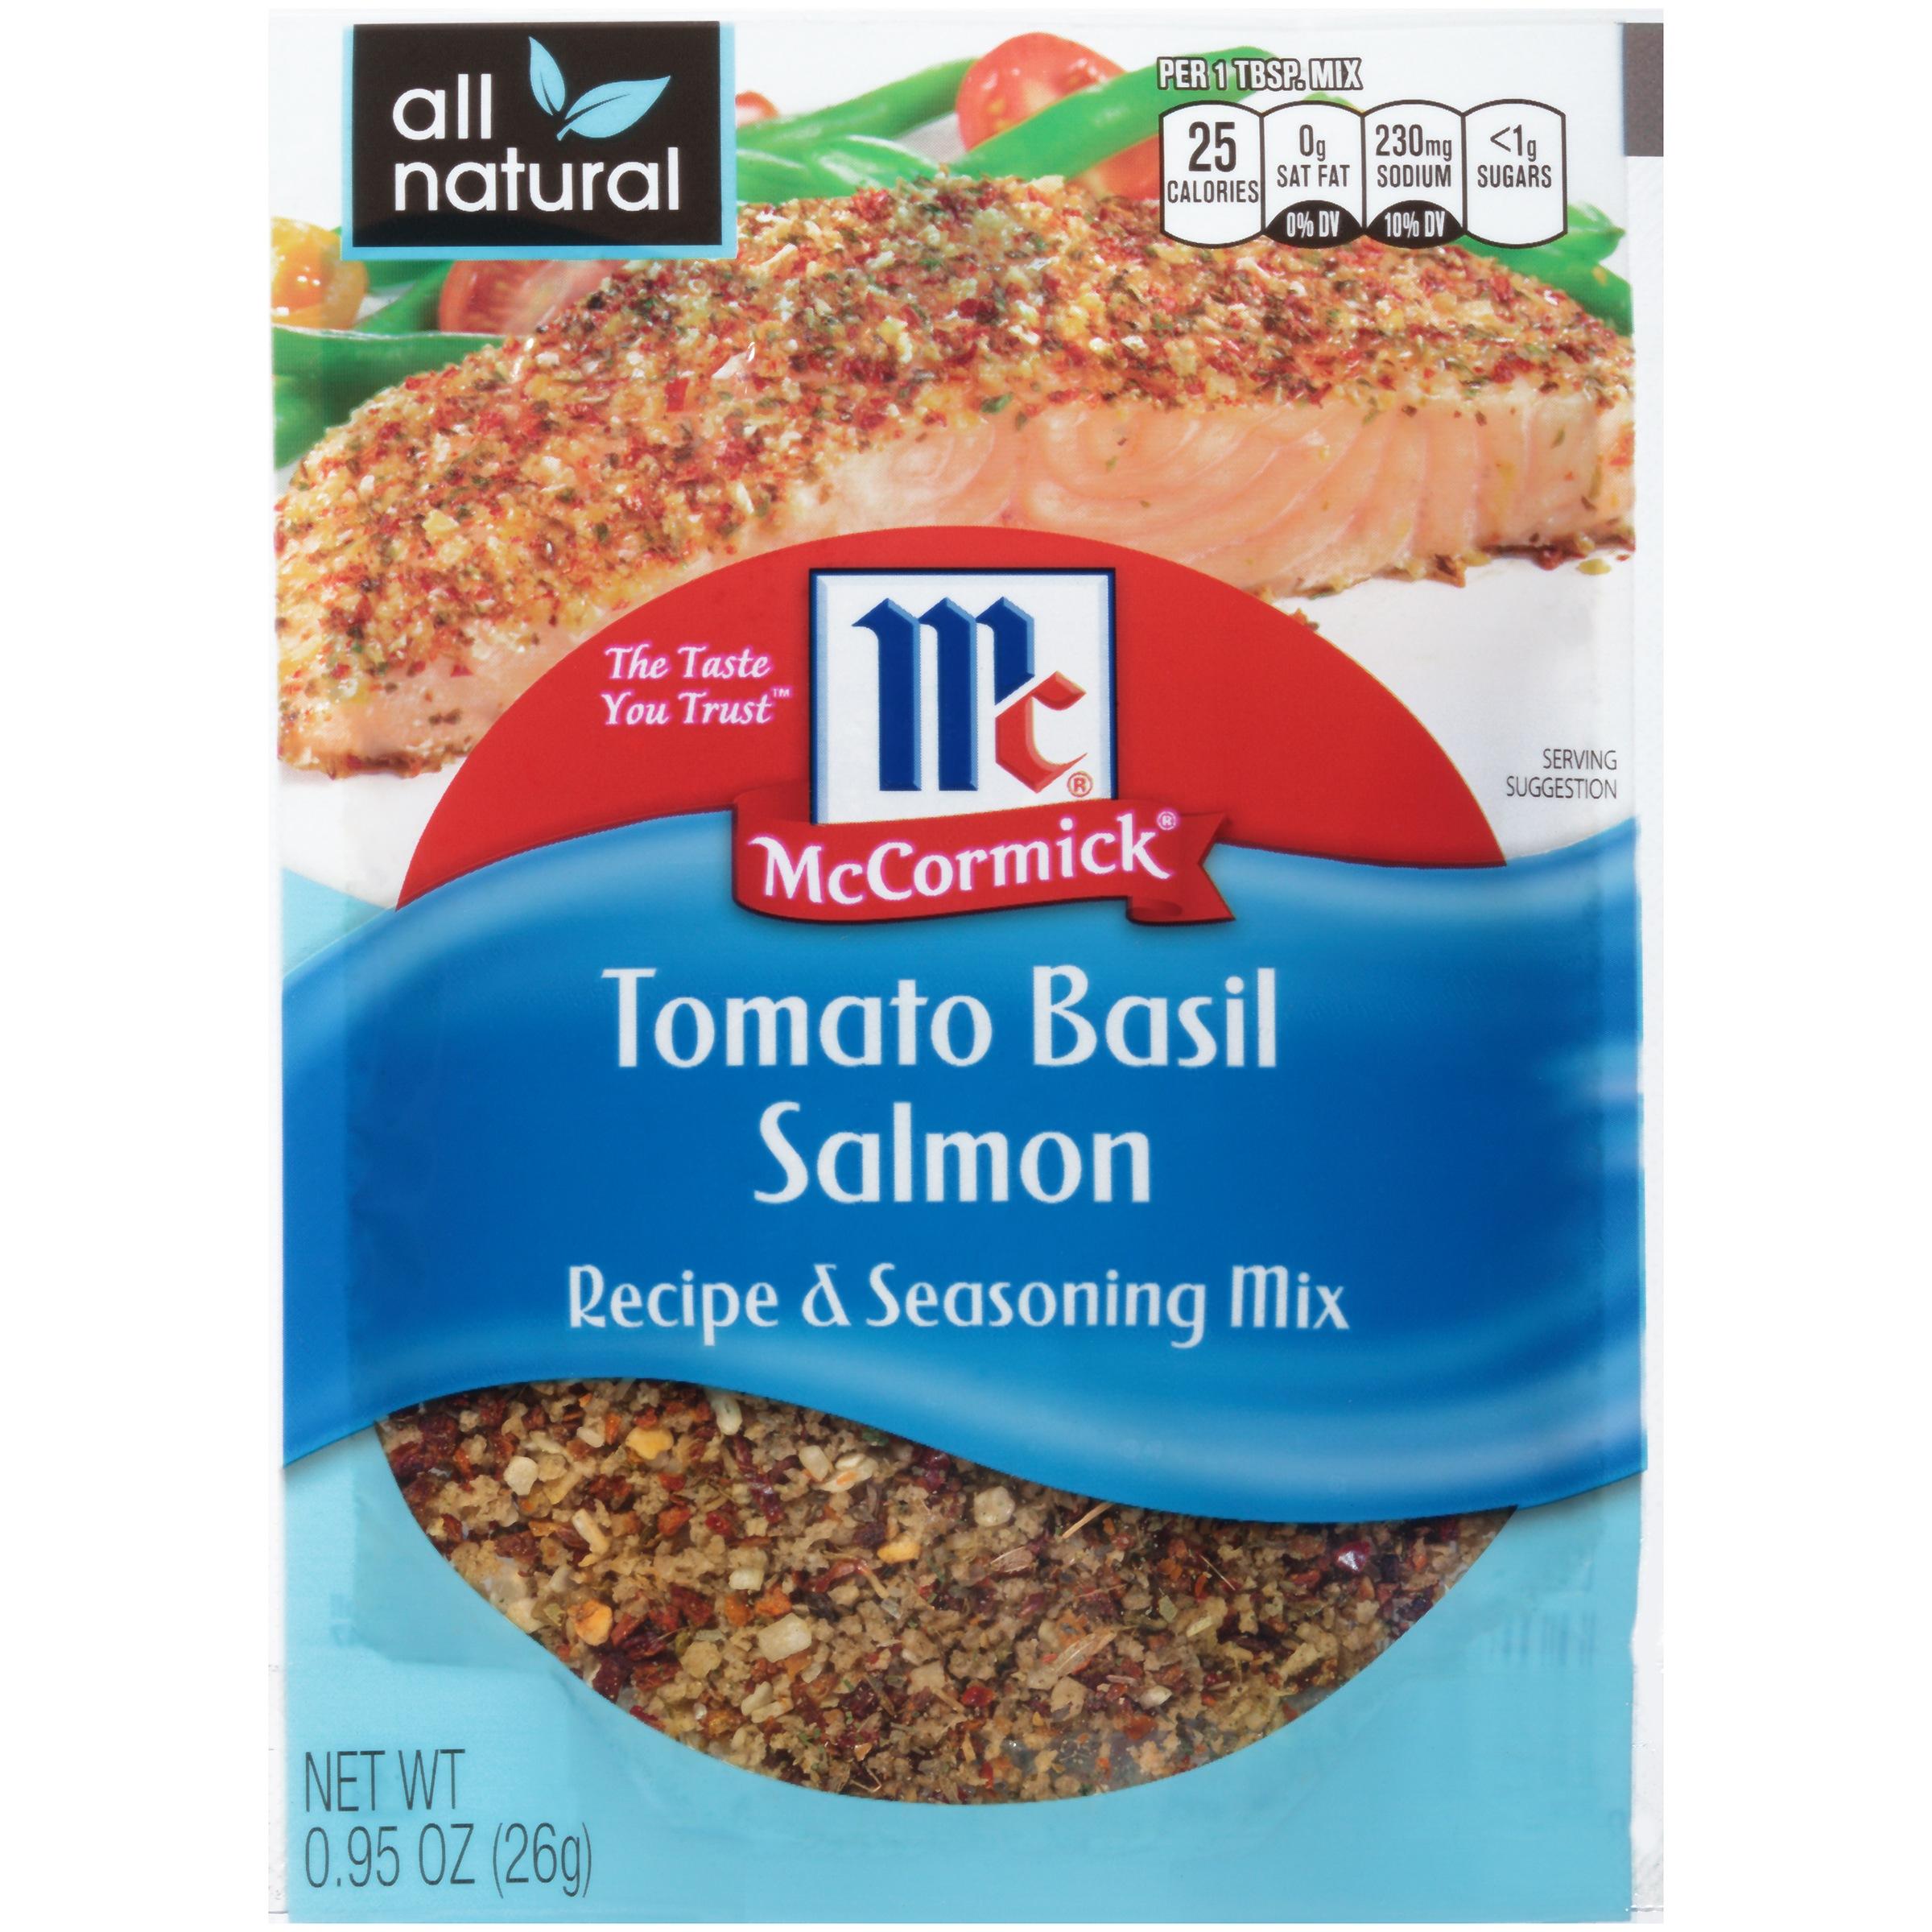 McCormick Tomato Basil Salmon Recipe & Seasoning Mix, 0.95 oz